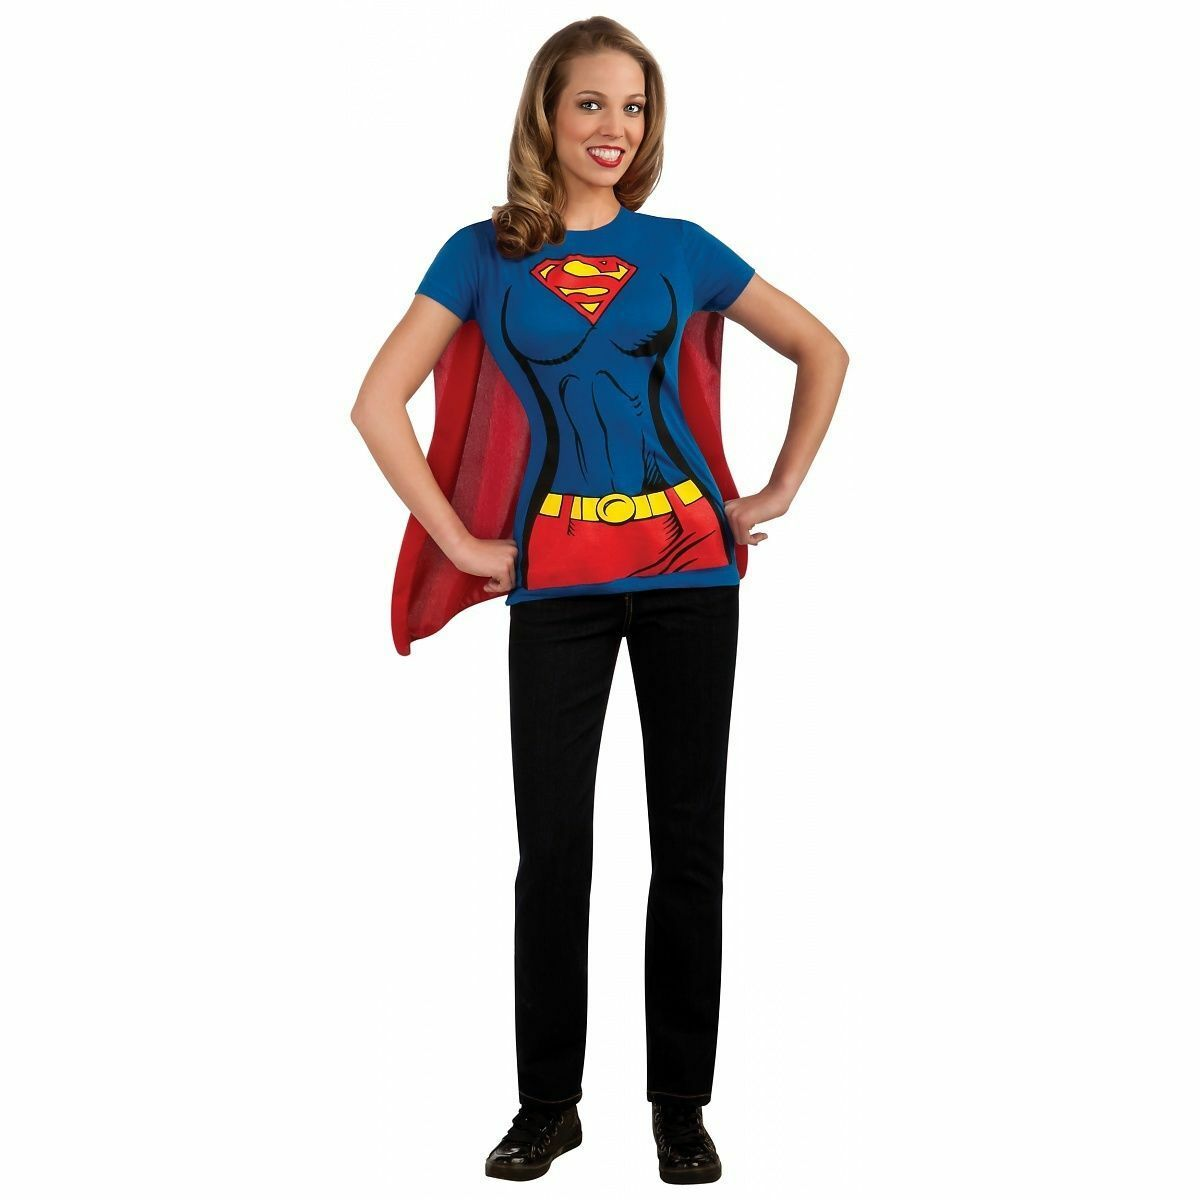 /Small Adulto Costume/ Rubie s Ufficiale da Donna Batman t-Shirt Set